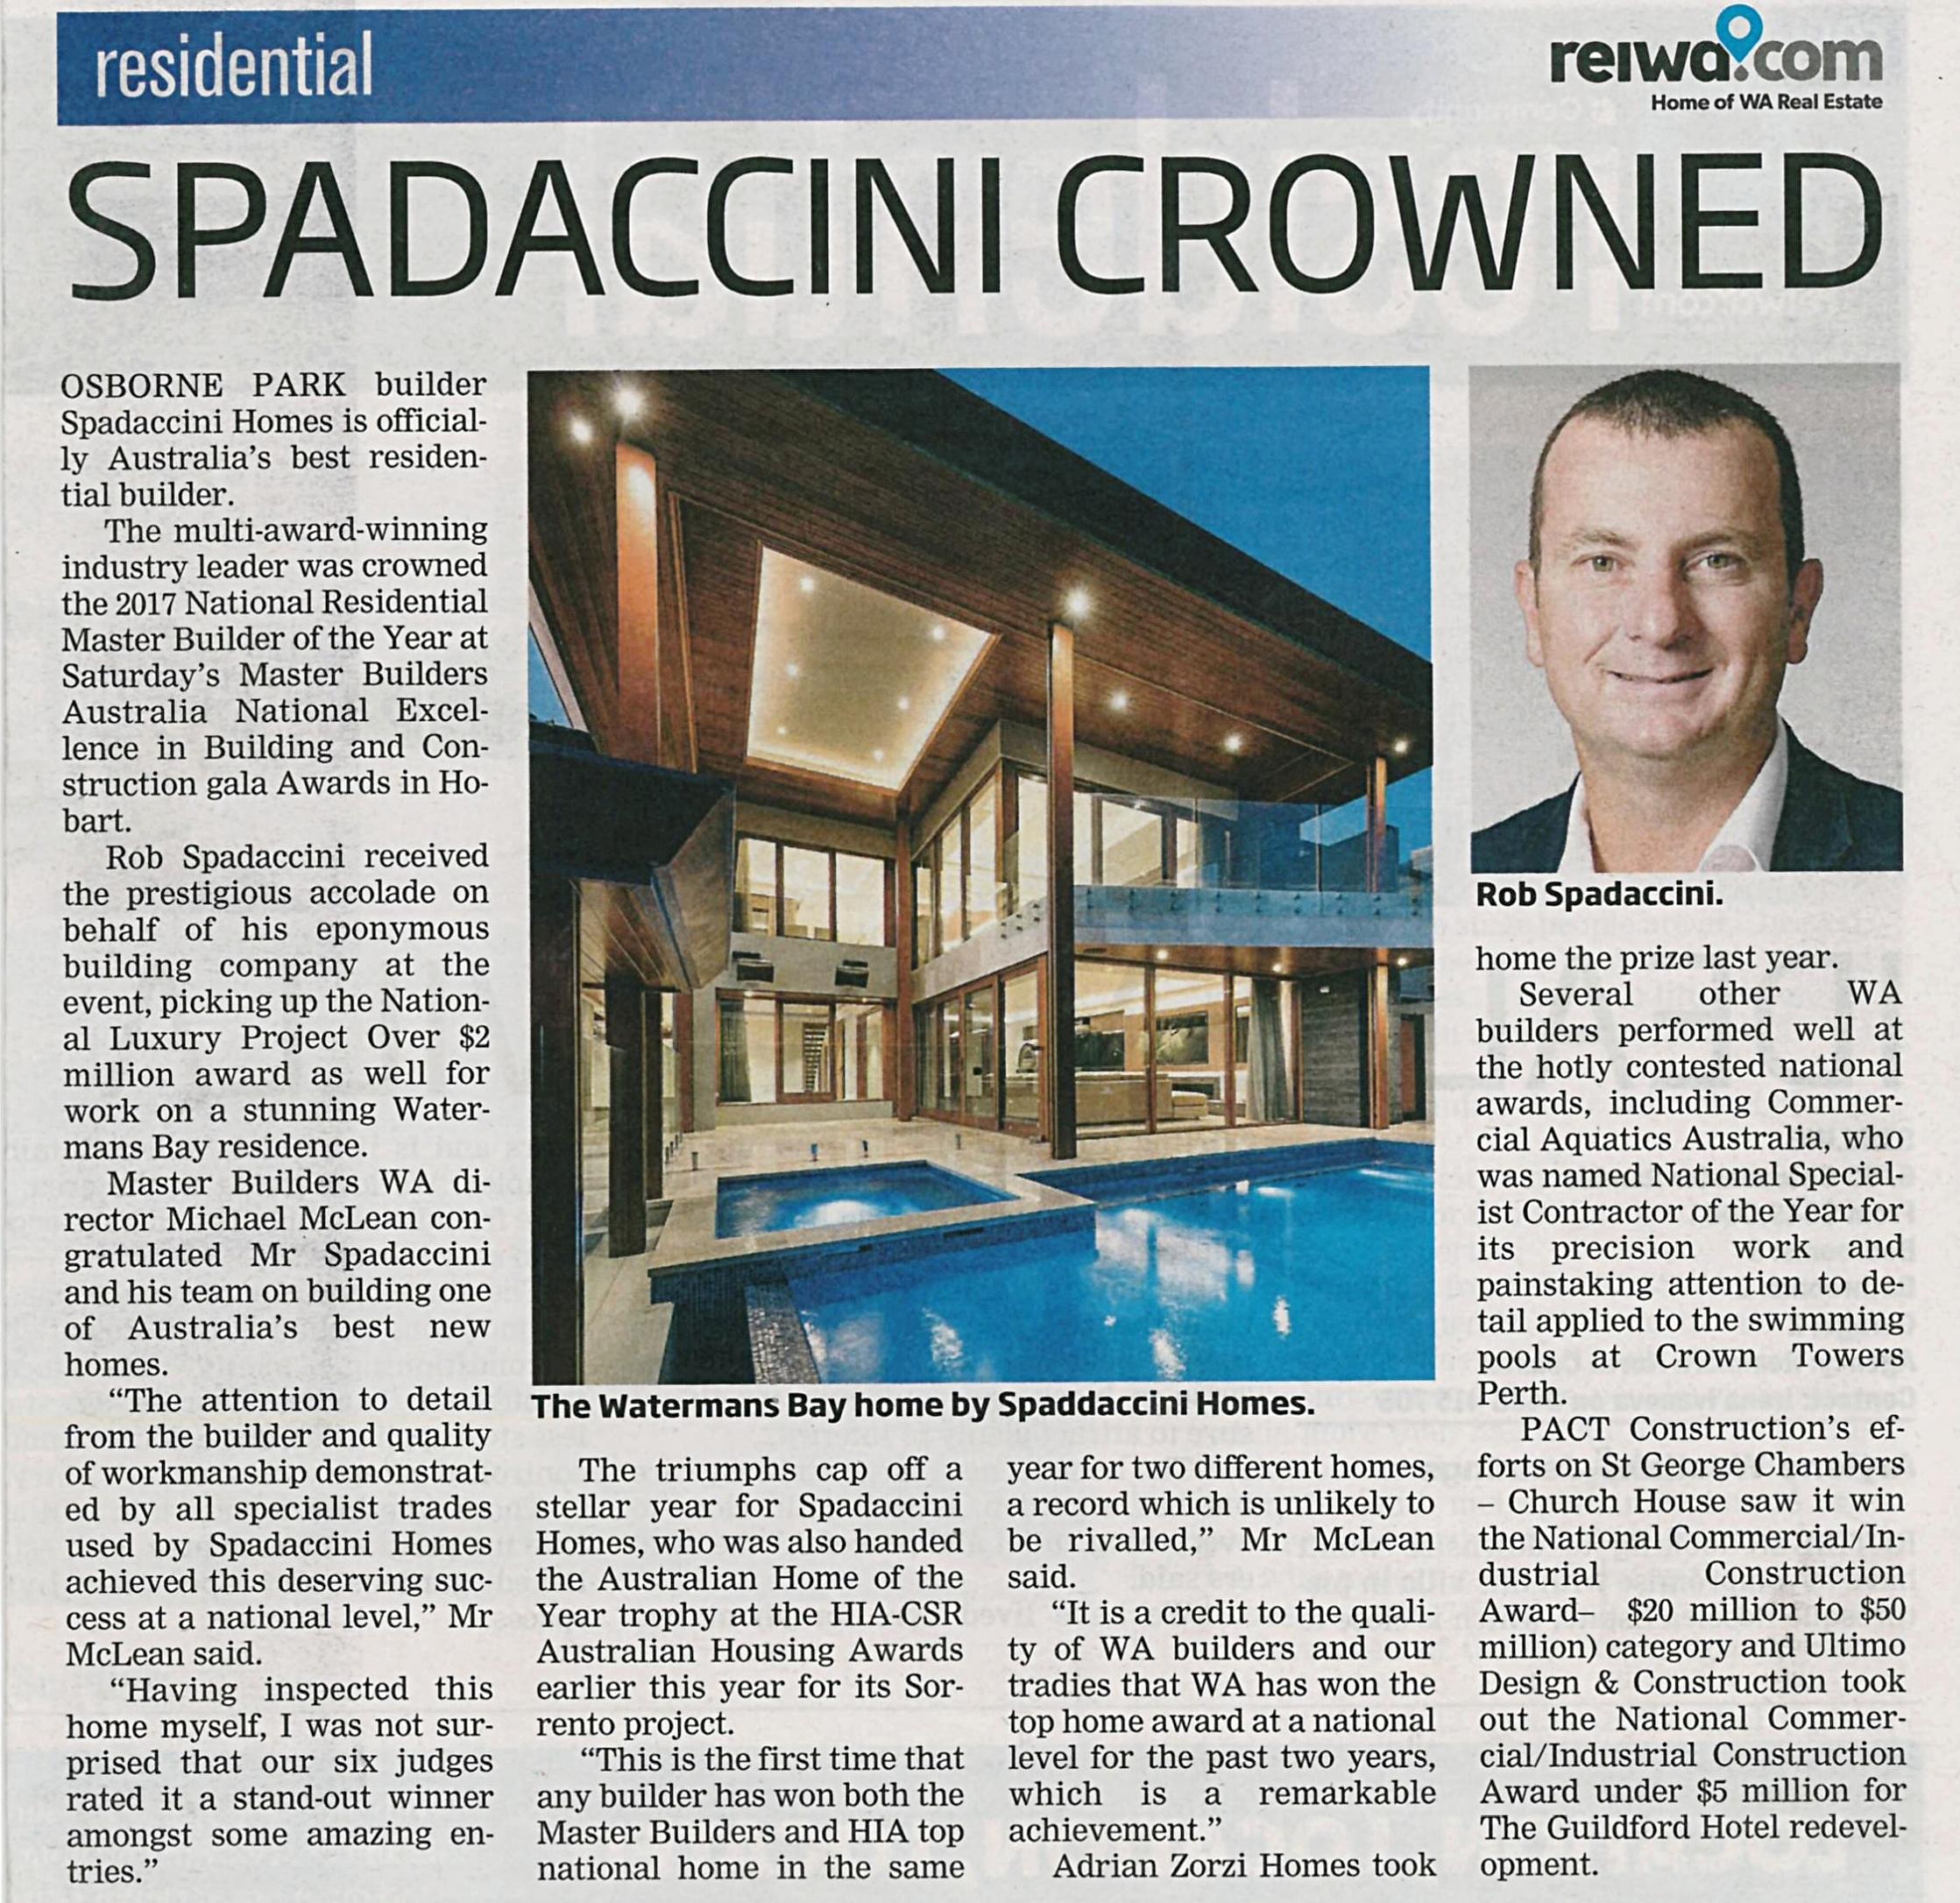 Spadaccini Crowned.jpg